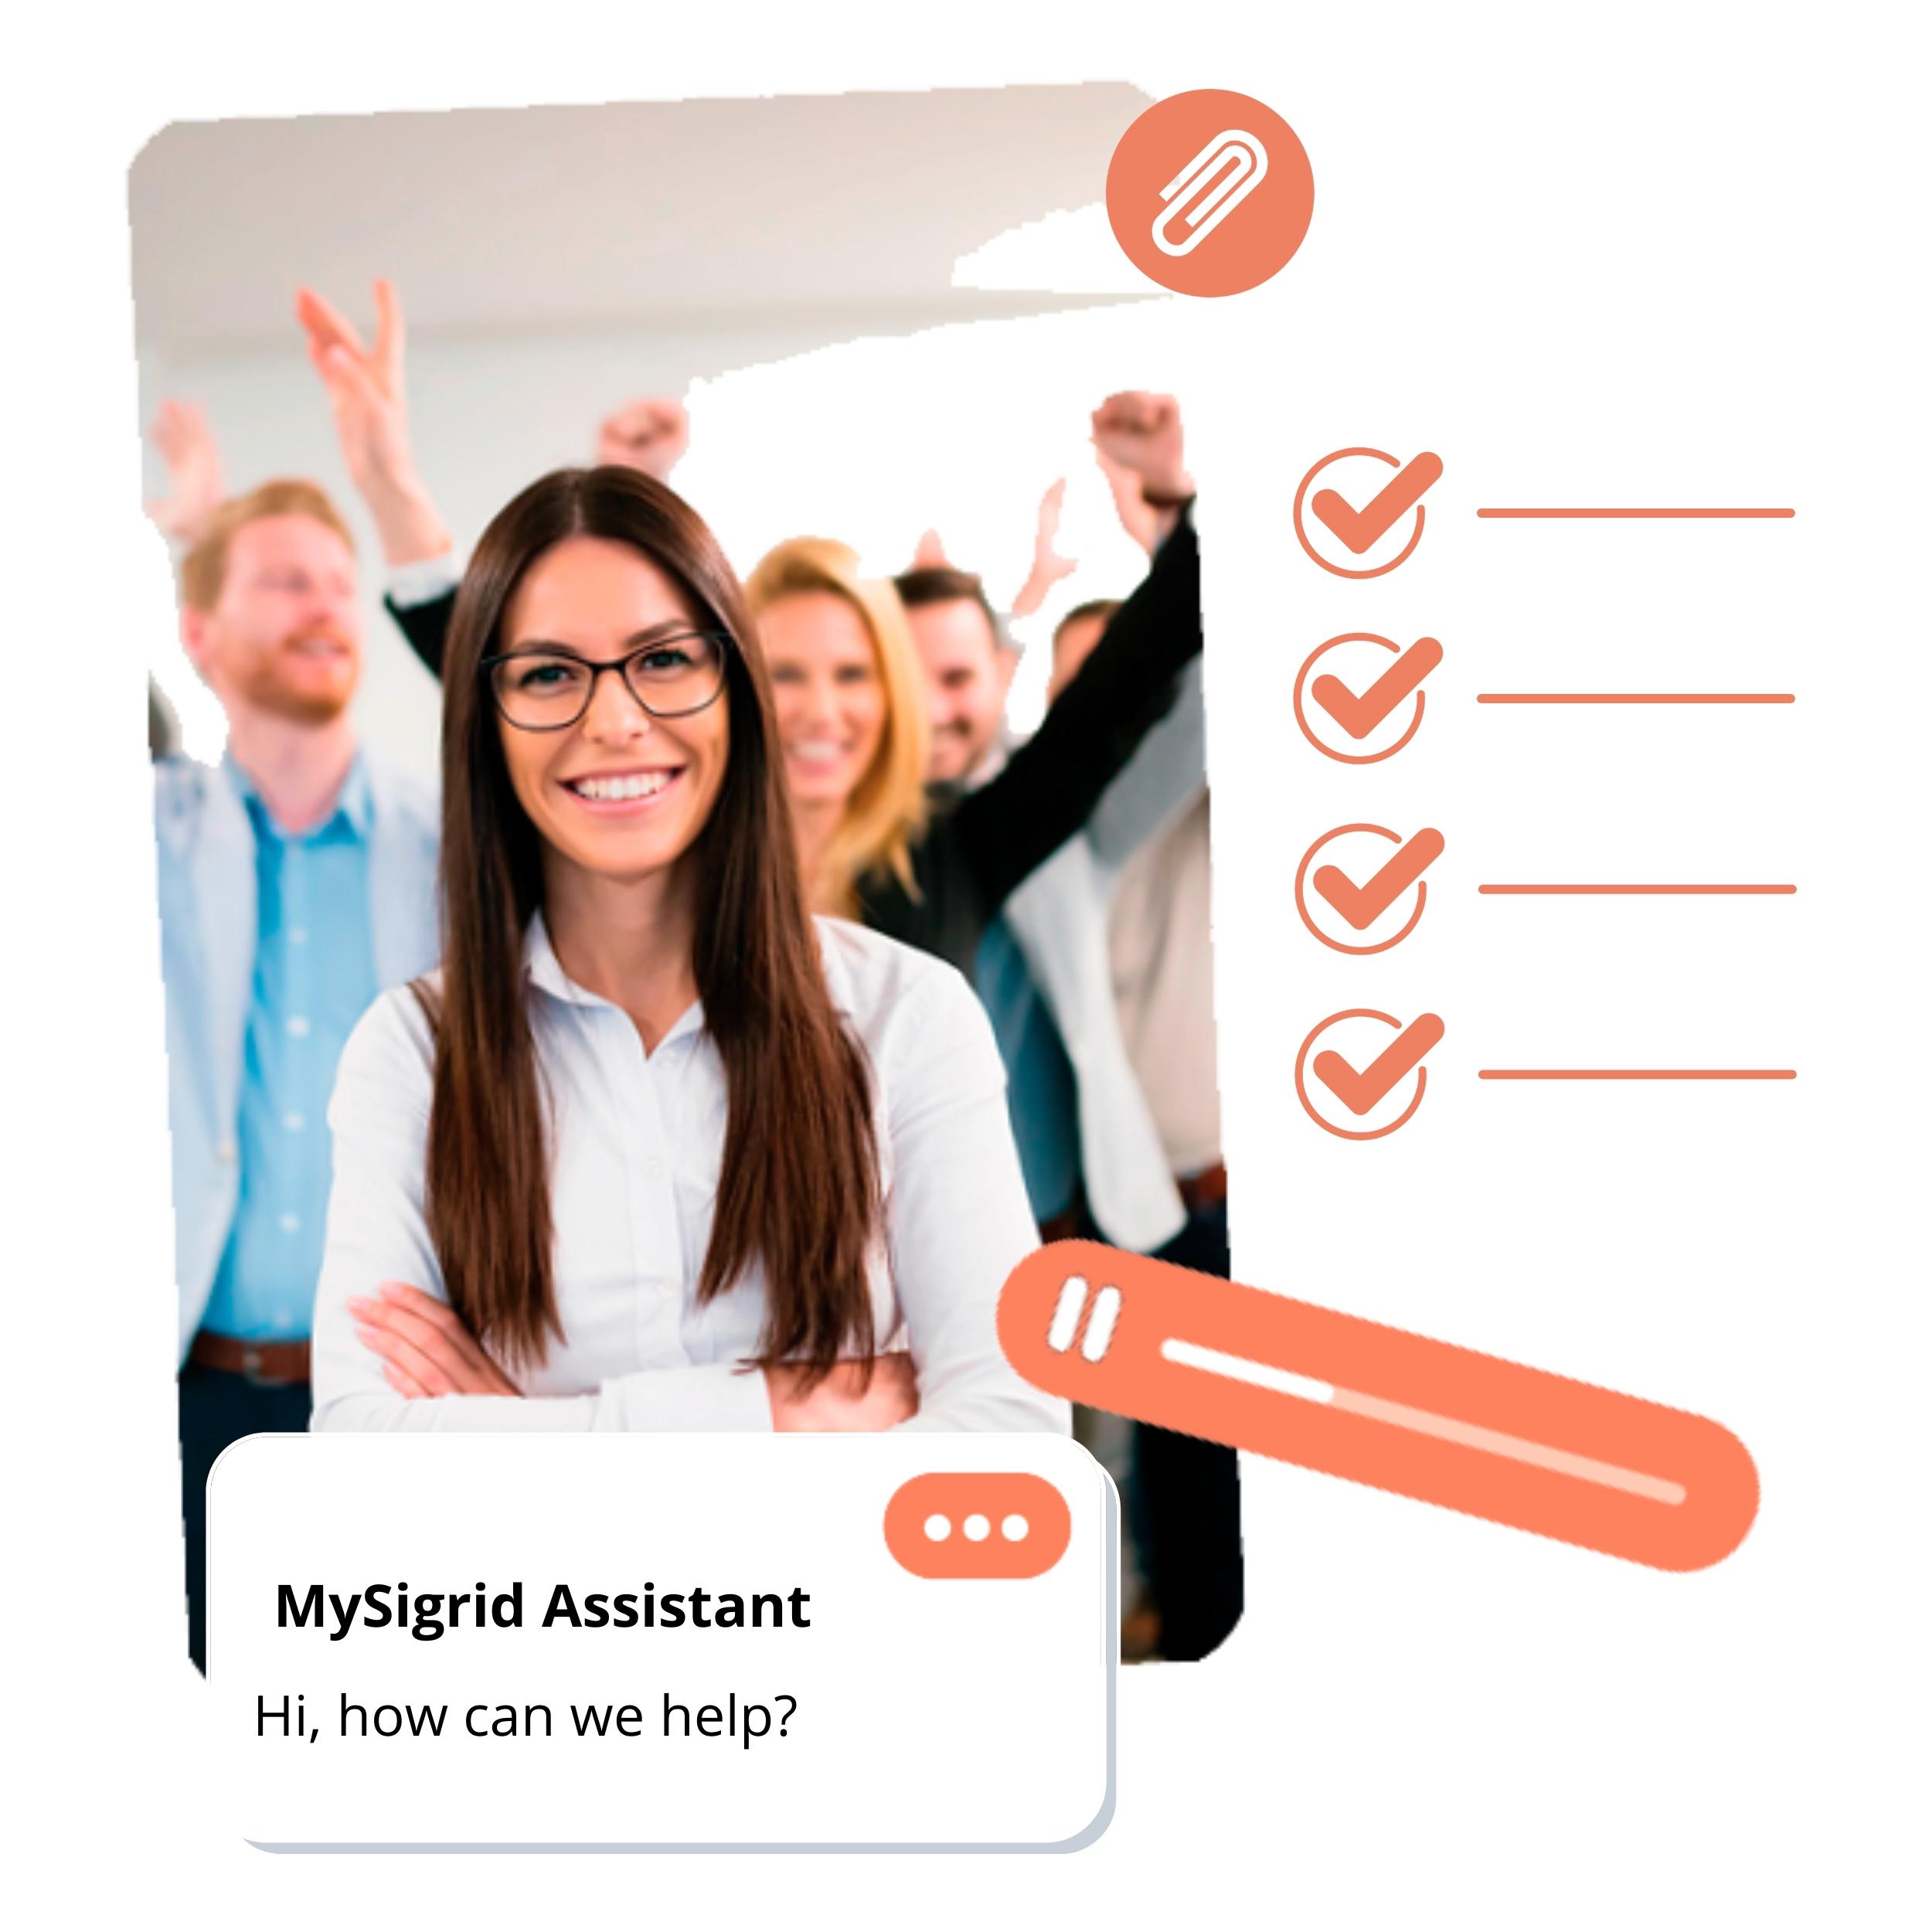 MySigrid Assistant